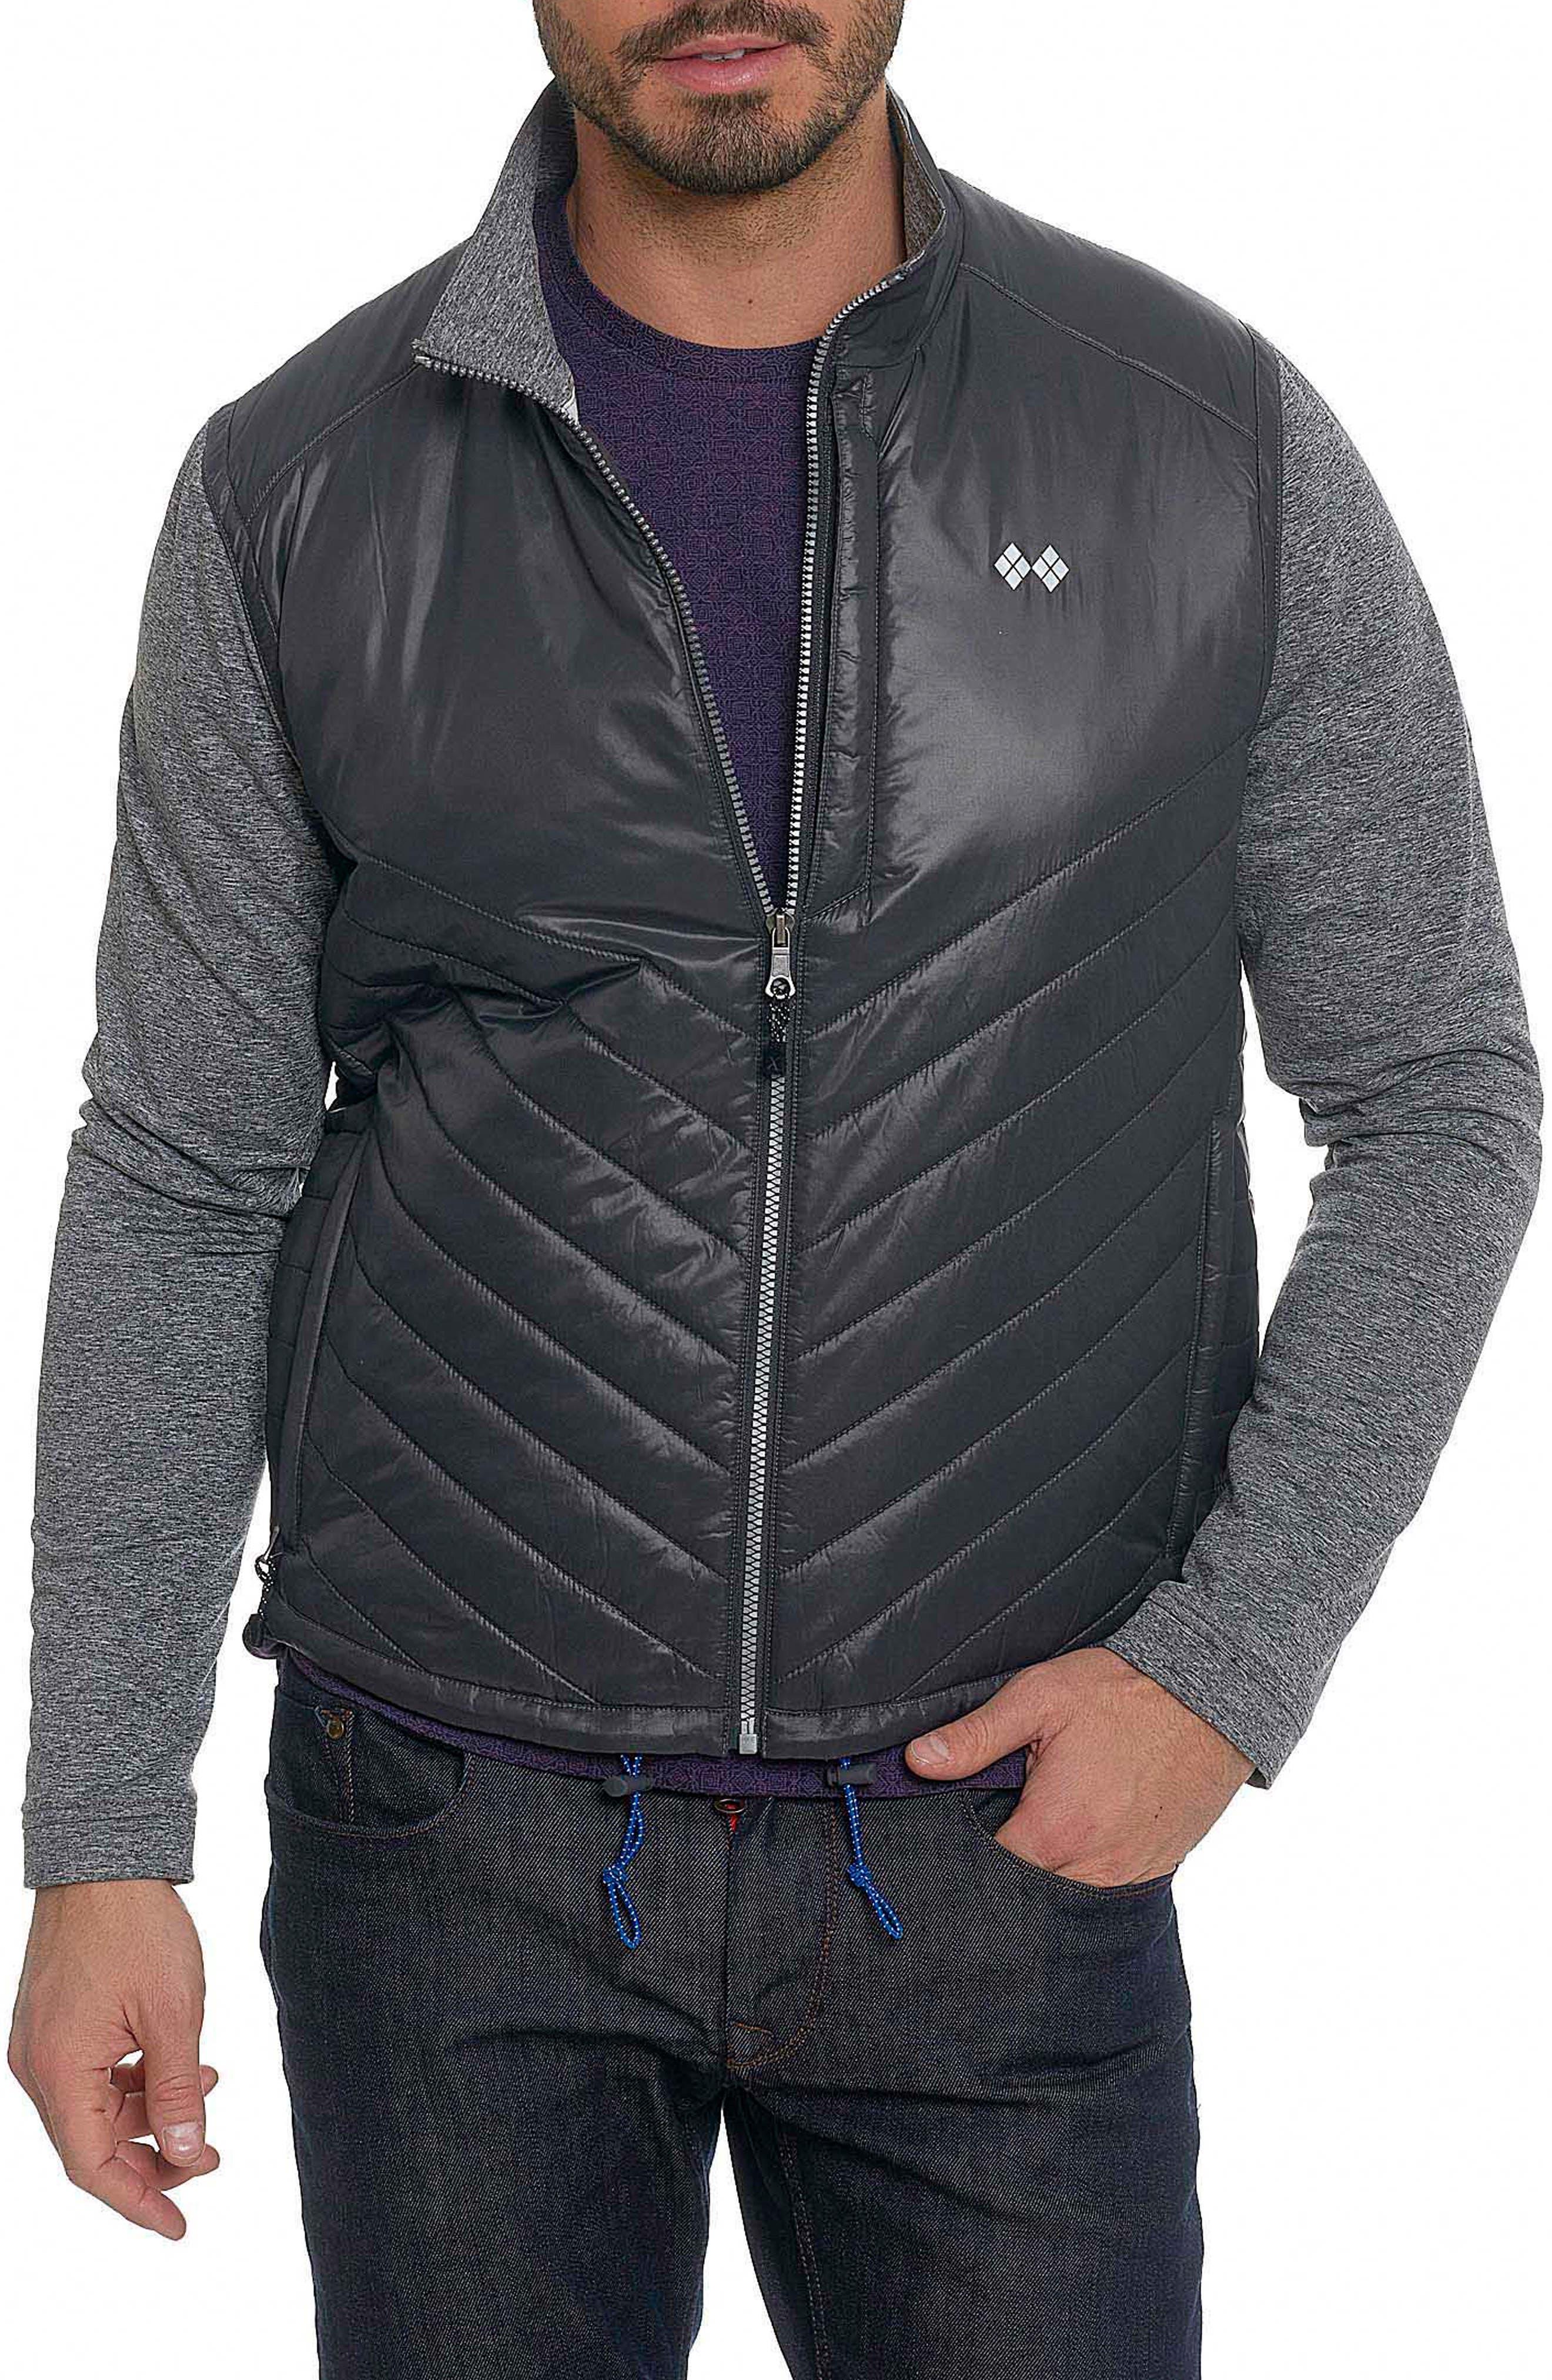 Poconos Tailored Fit Mixed Media Jacket,                         Main,                         color, 060